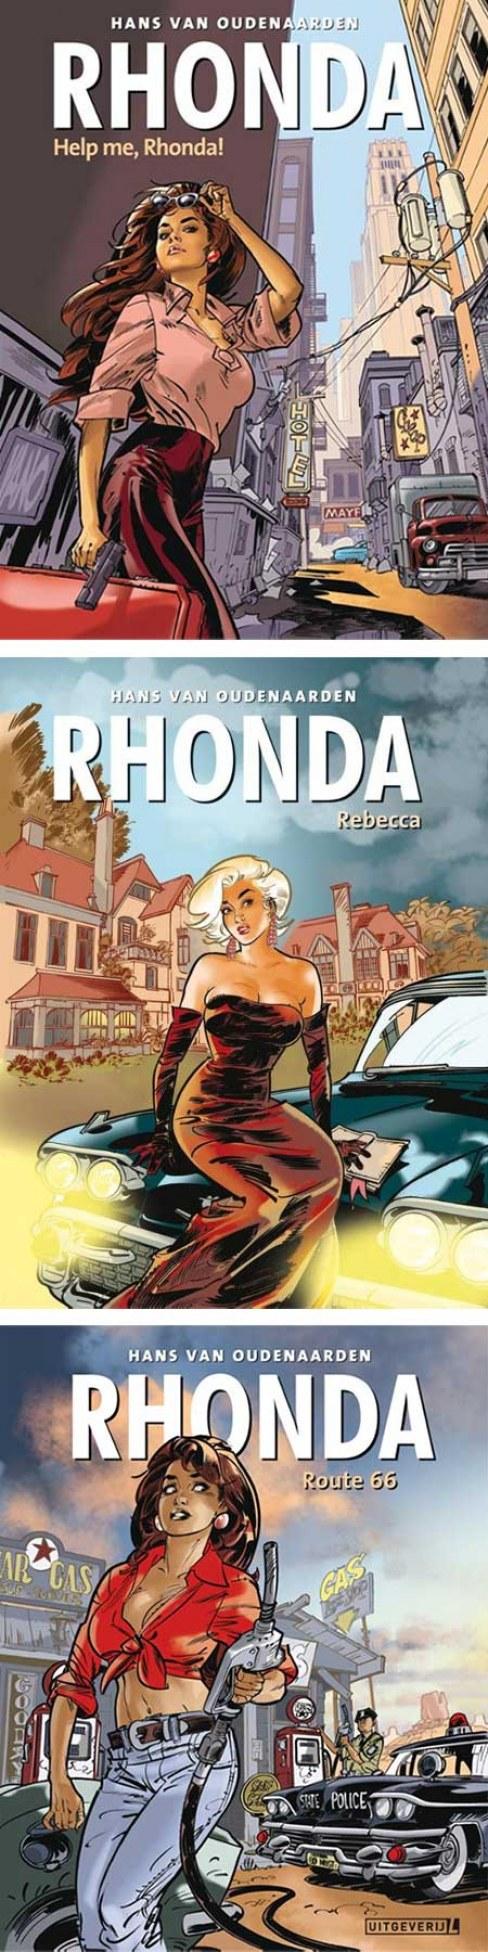 Hans van Oudenaardens Rhonda trilogie